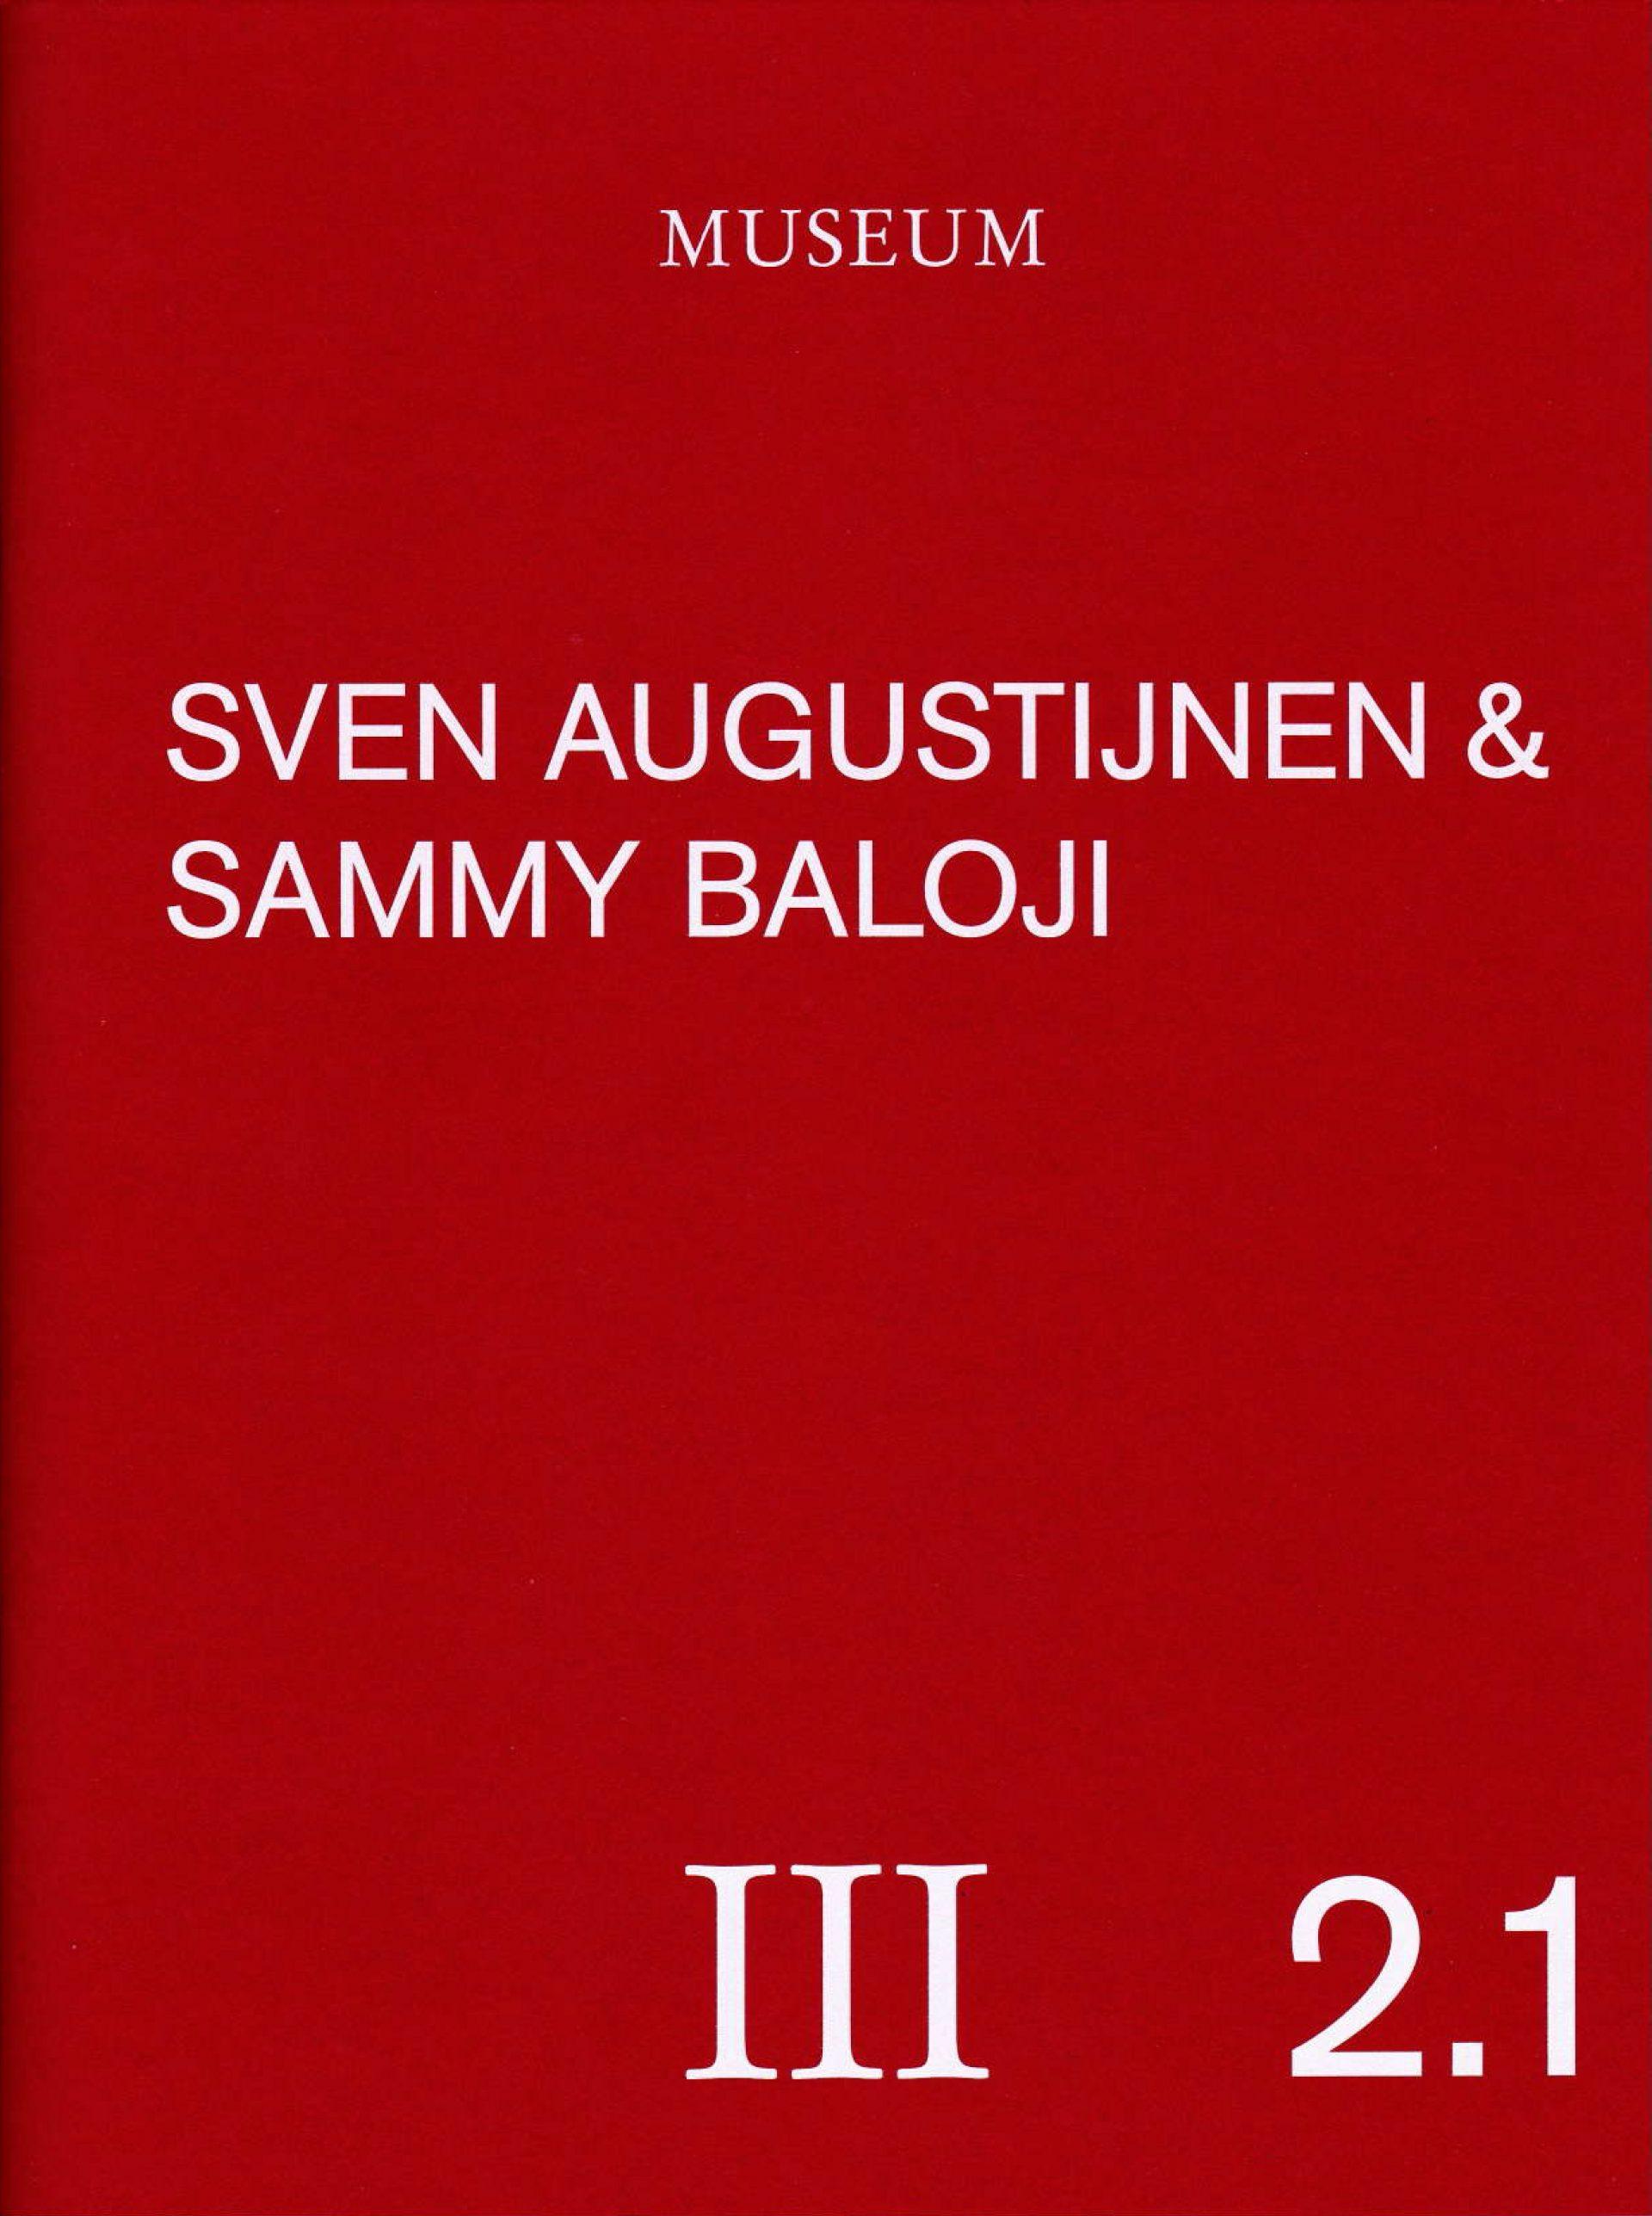 Sven Augustijnen, catalogue